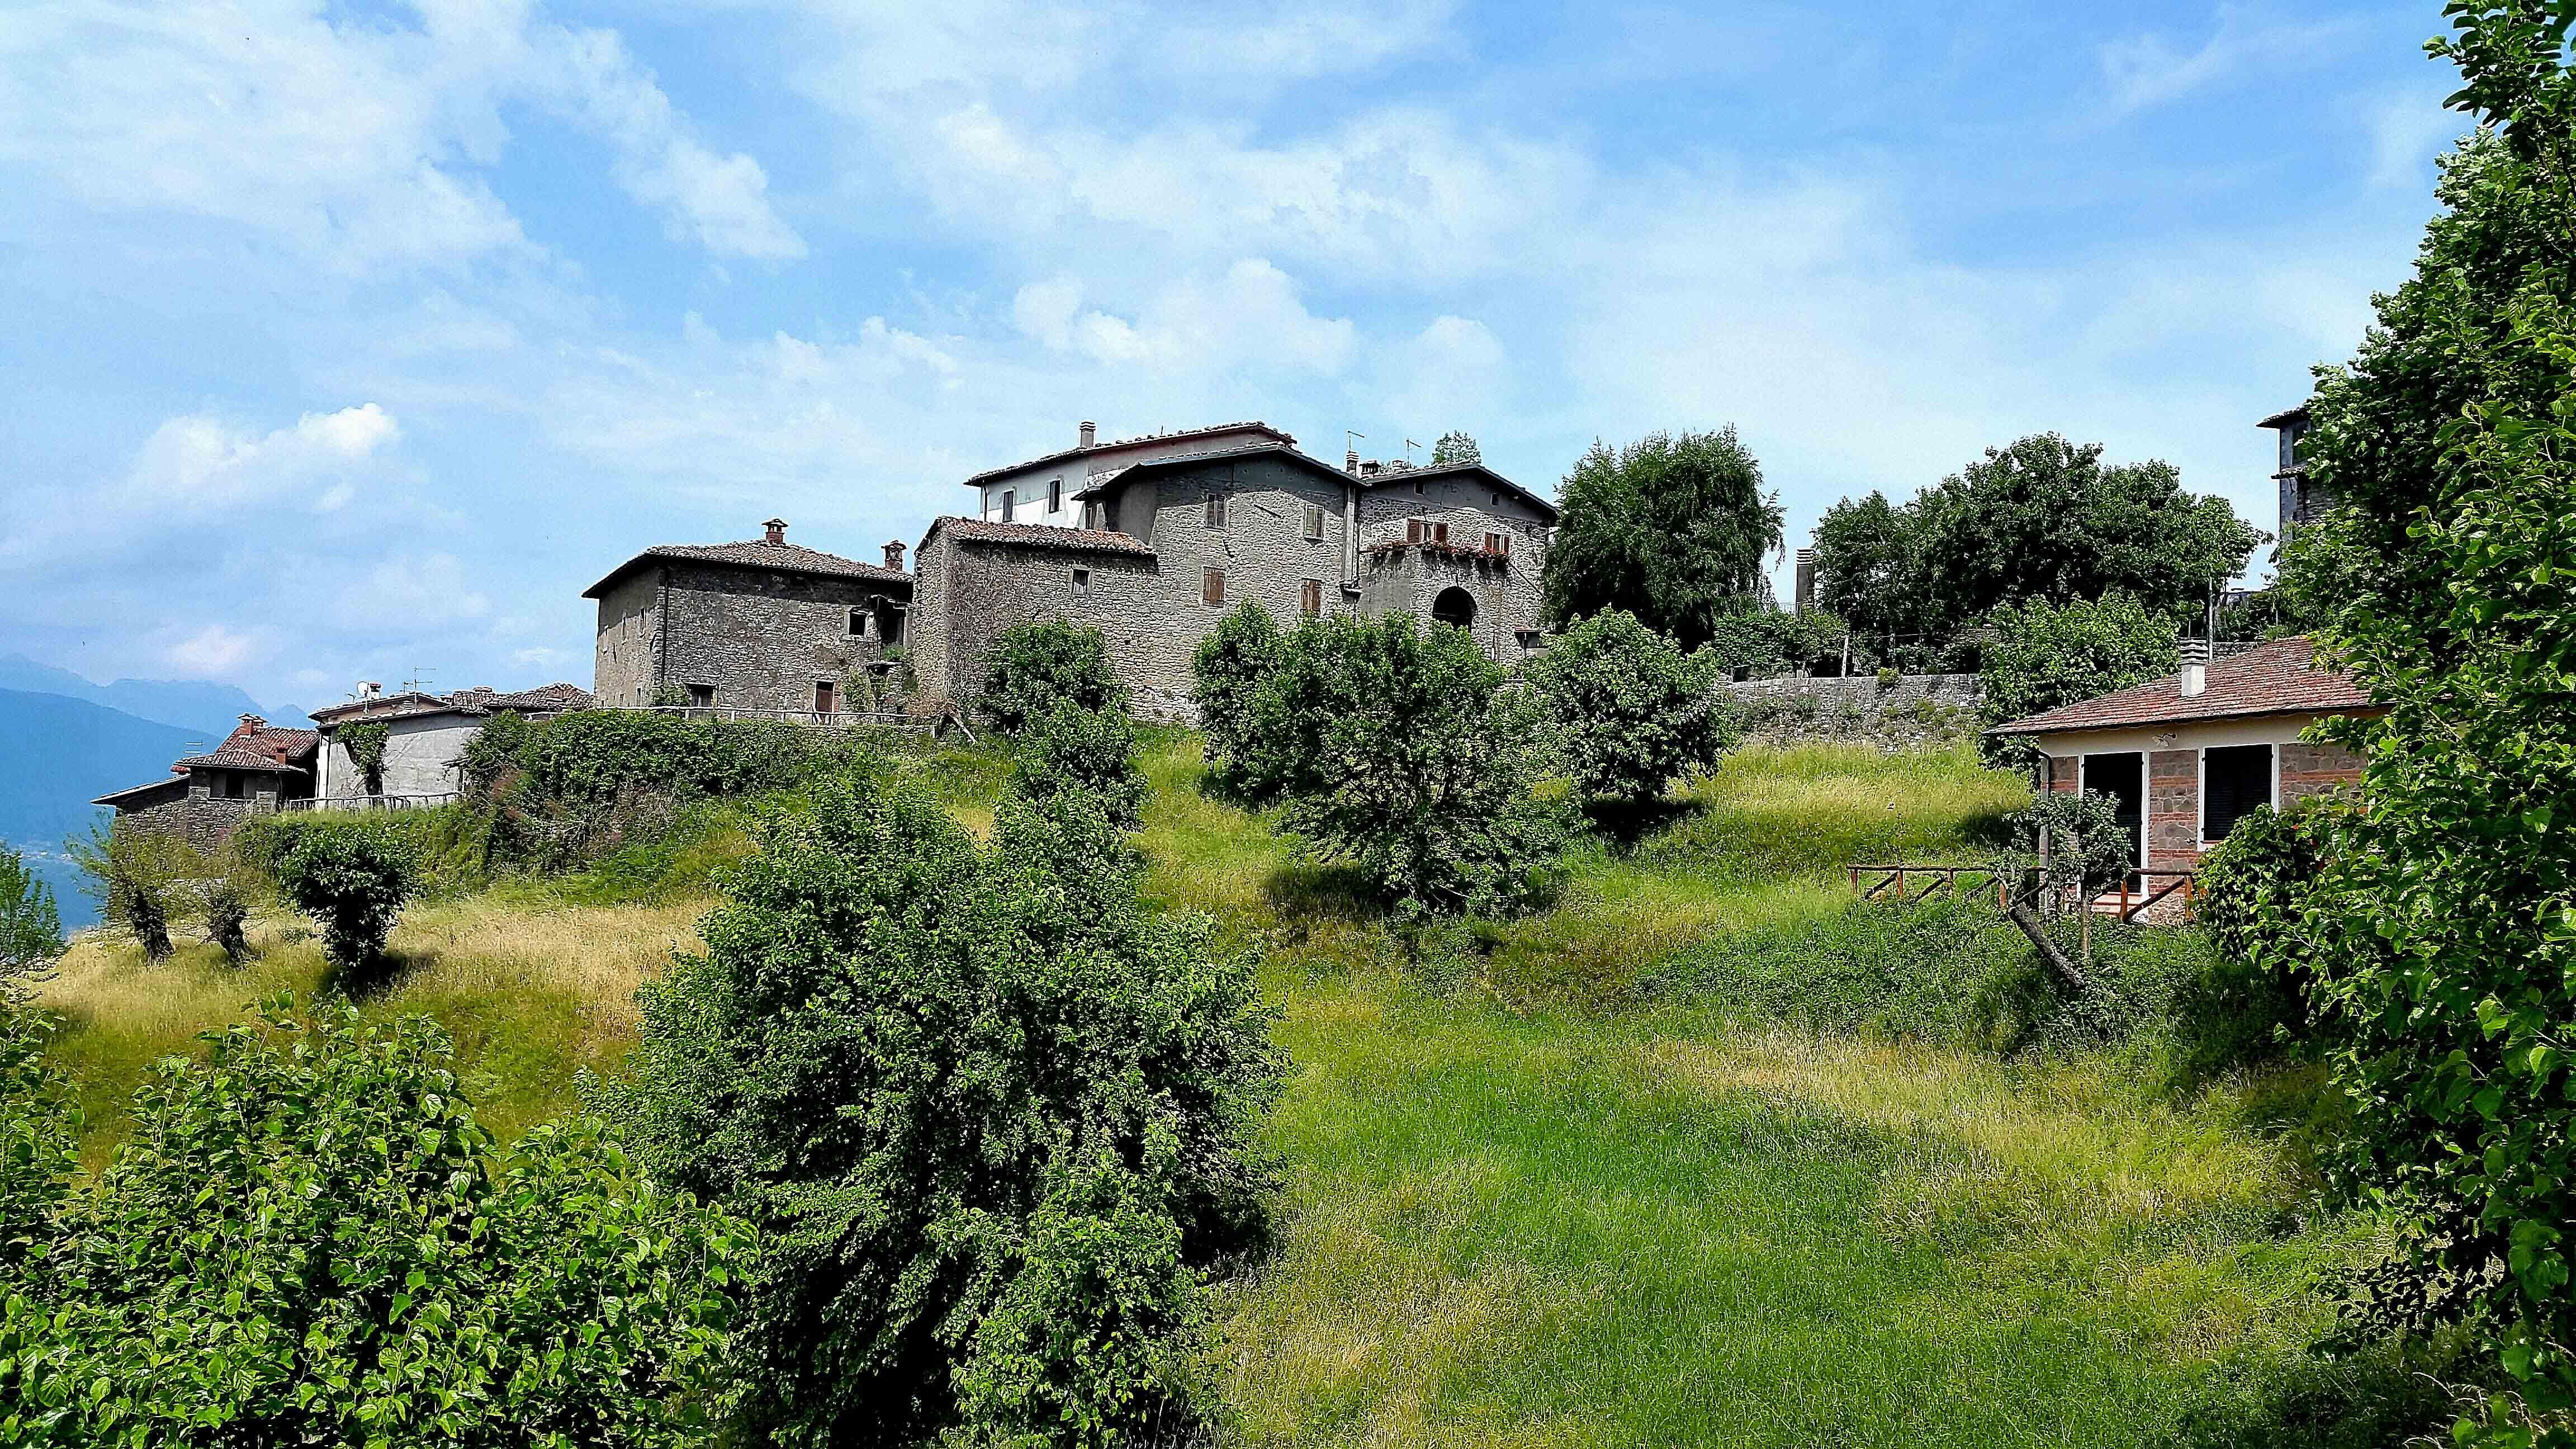 Silico | Gemt i Garfagnana